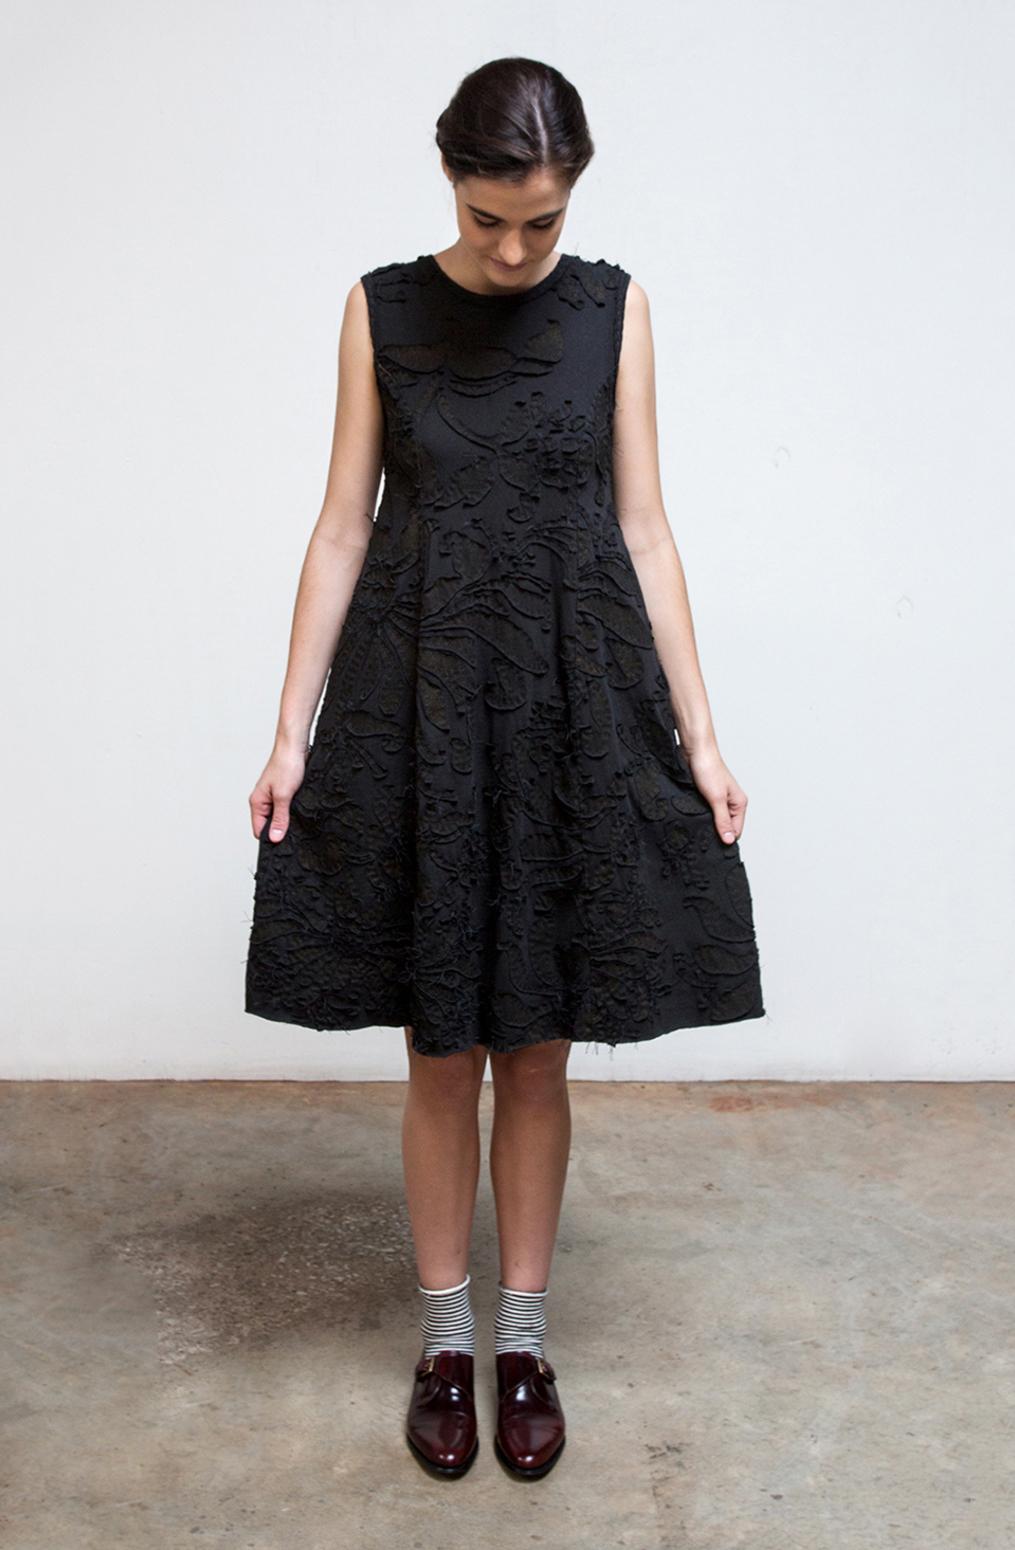 The school of making factory dress pattern 1